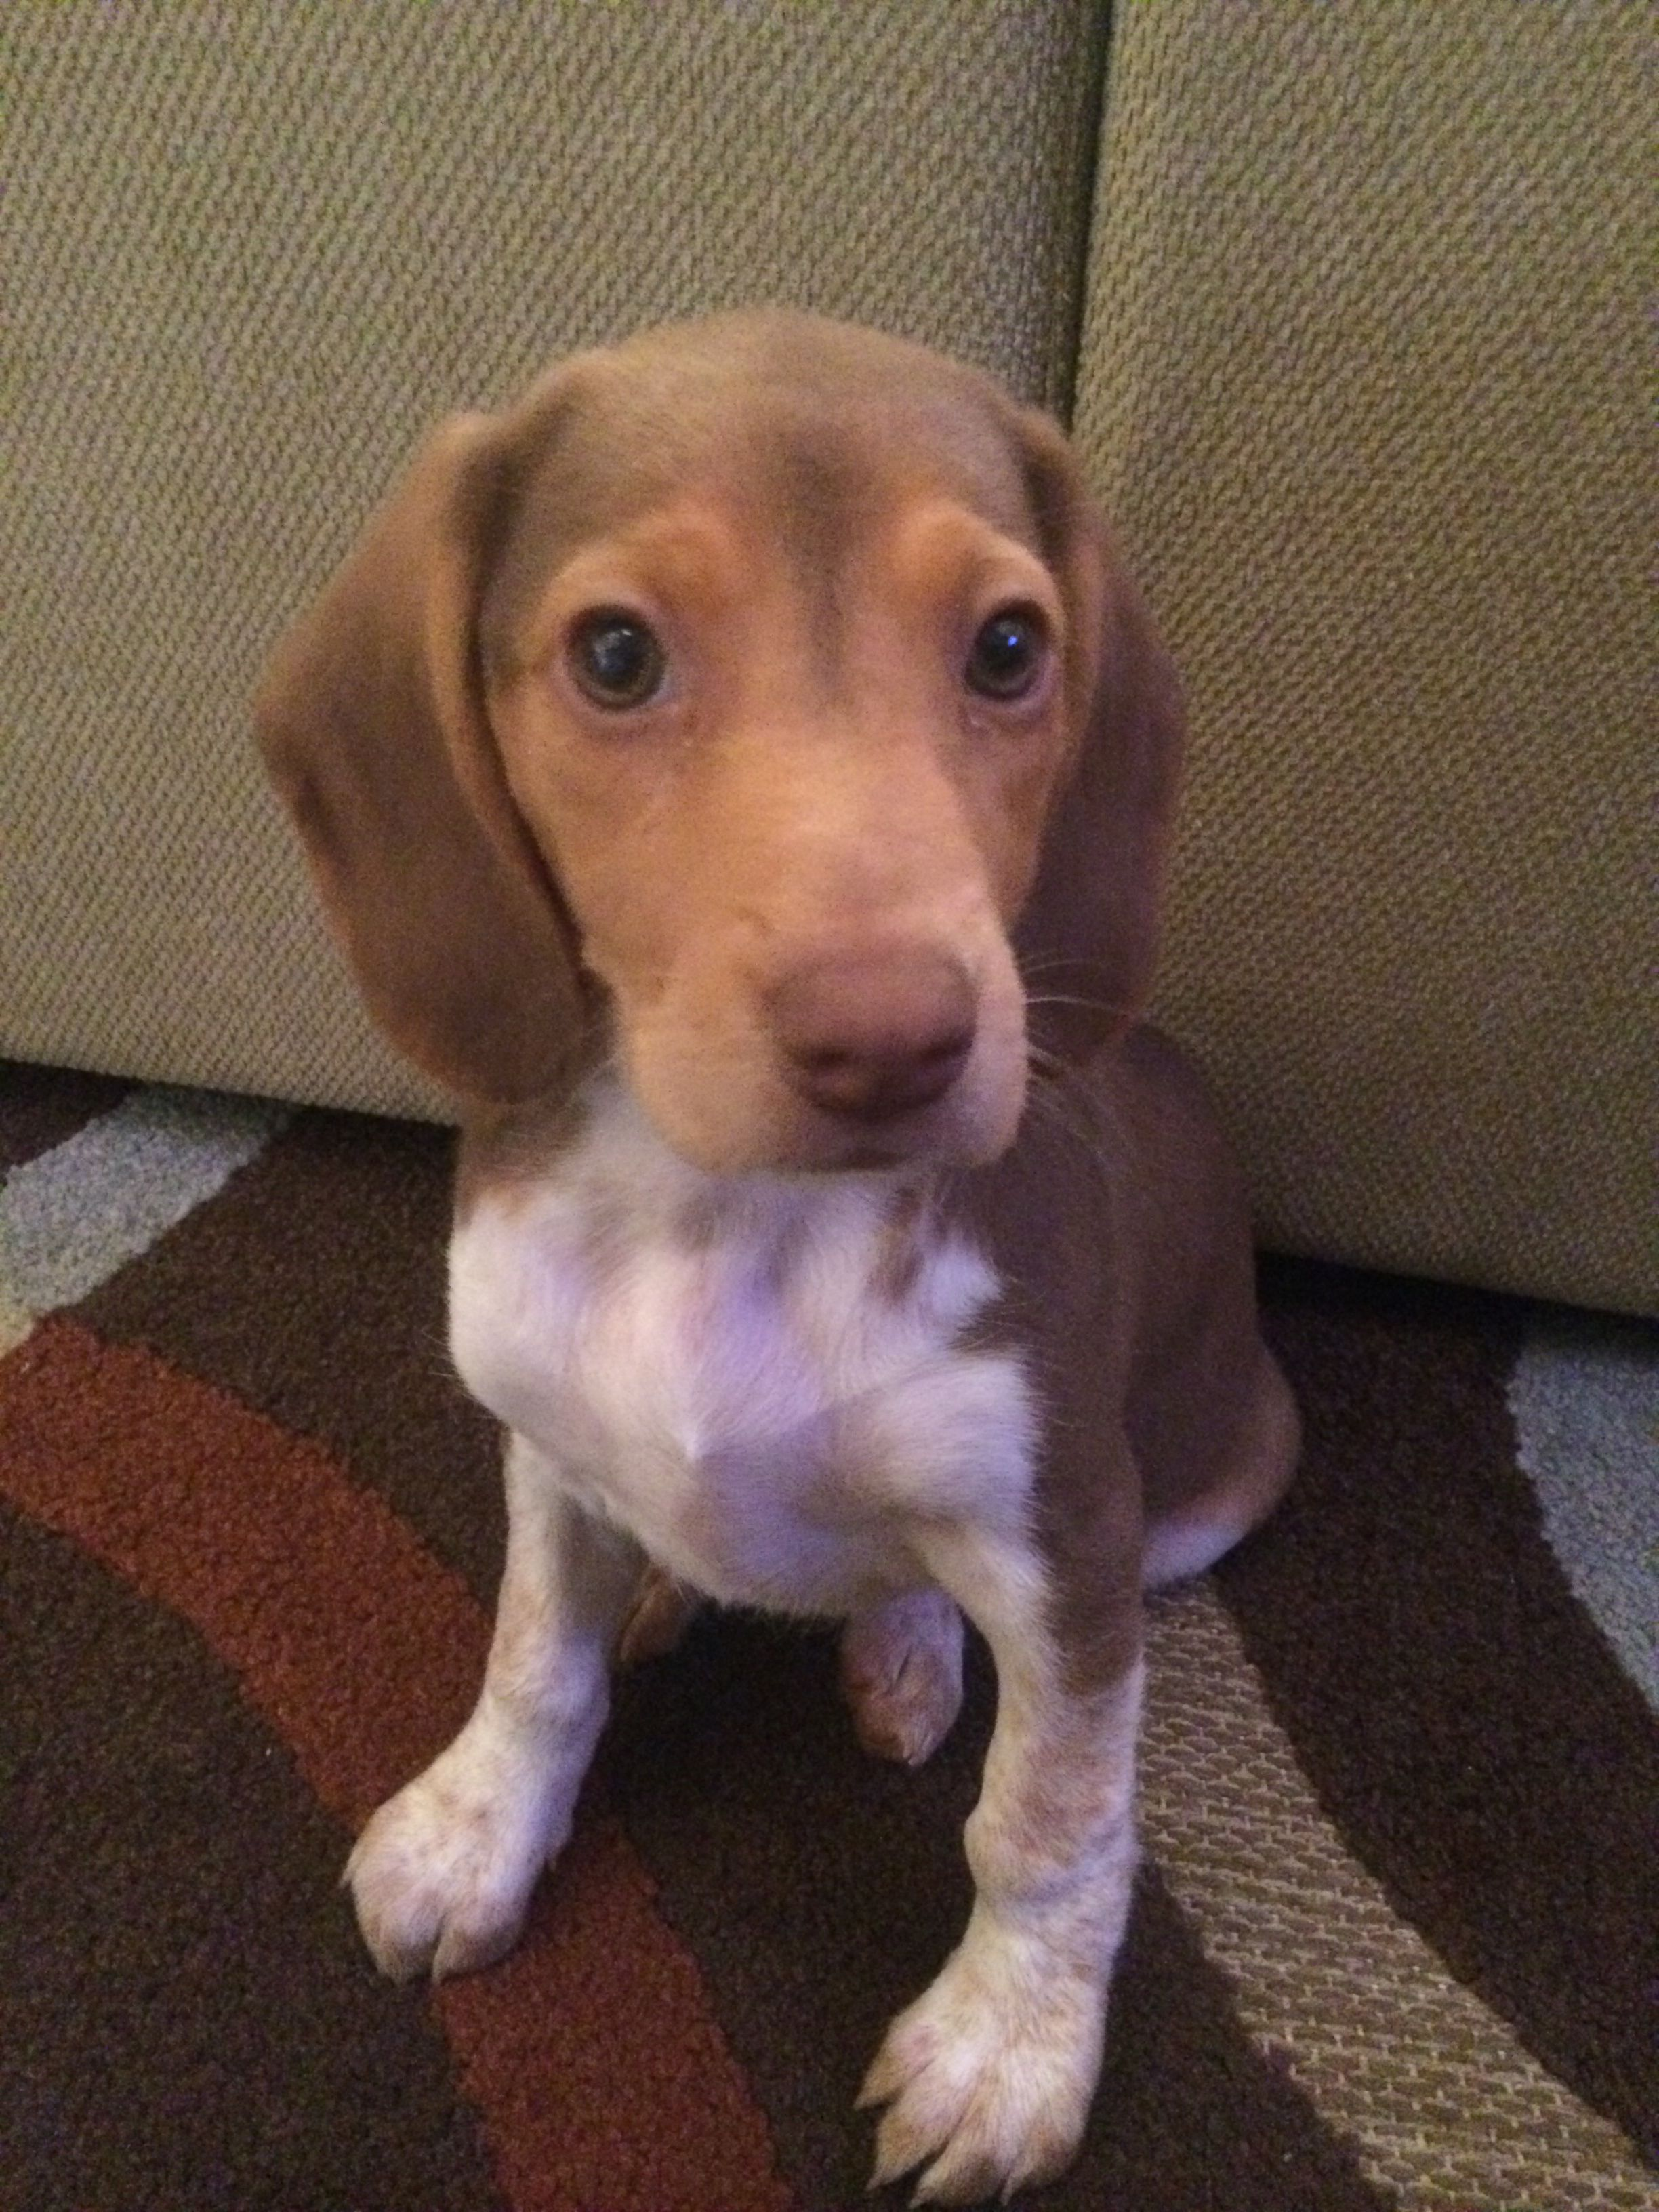 Beagle Dog Breed Information Beagle Dog Breed Beagle Dog